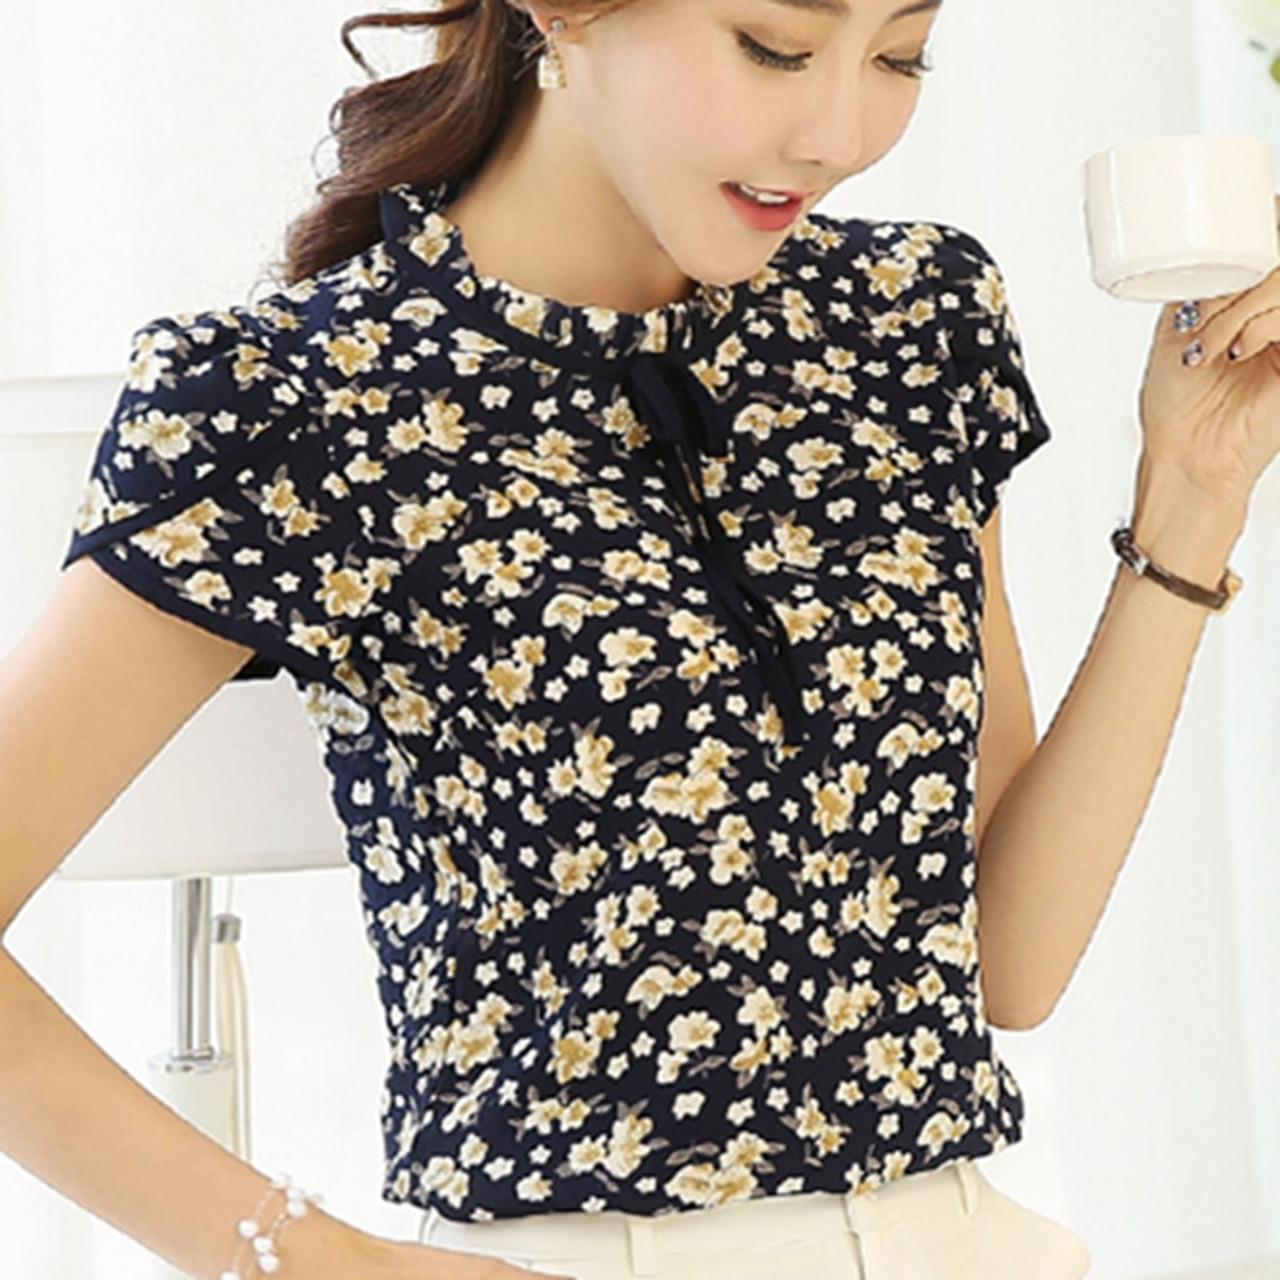 ec160b105e 2017 Summer Floral Print Chiffon Blouse Ruffled Collar Bow Neck Shirt Petal  Short Sleeve Chiffon Tops ...